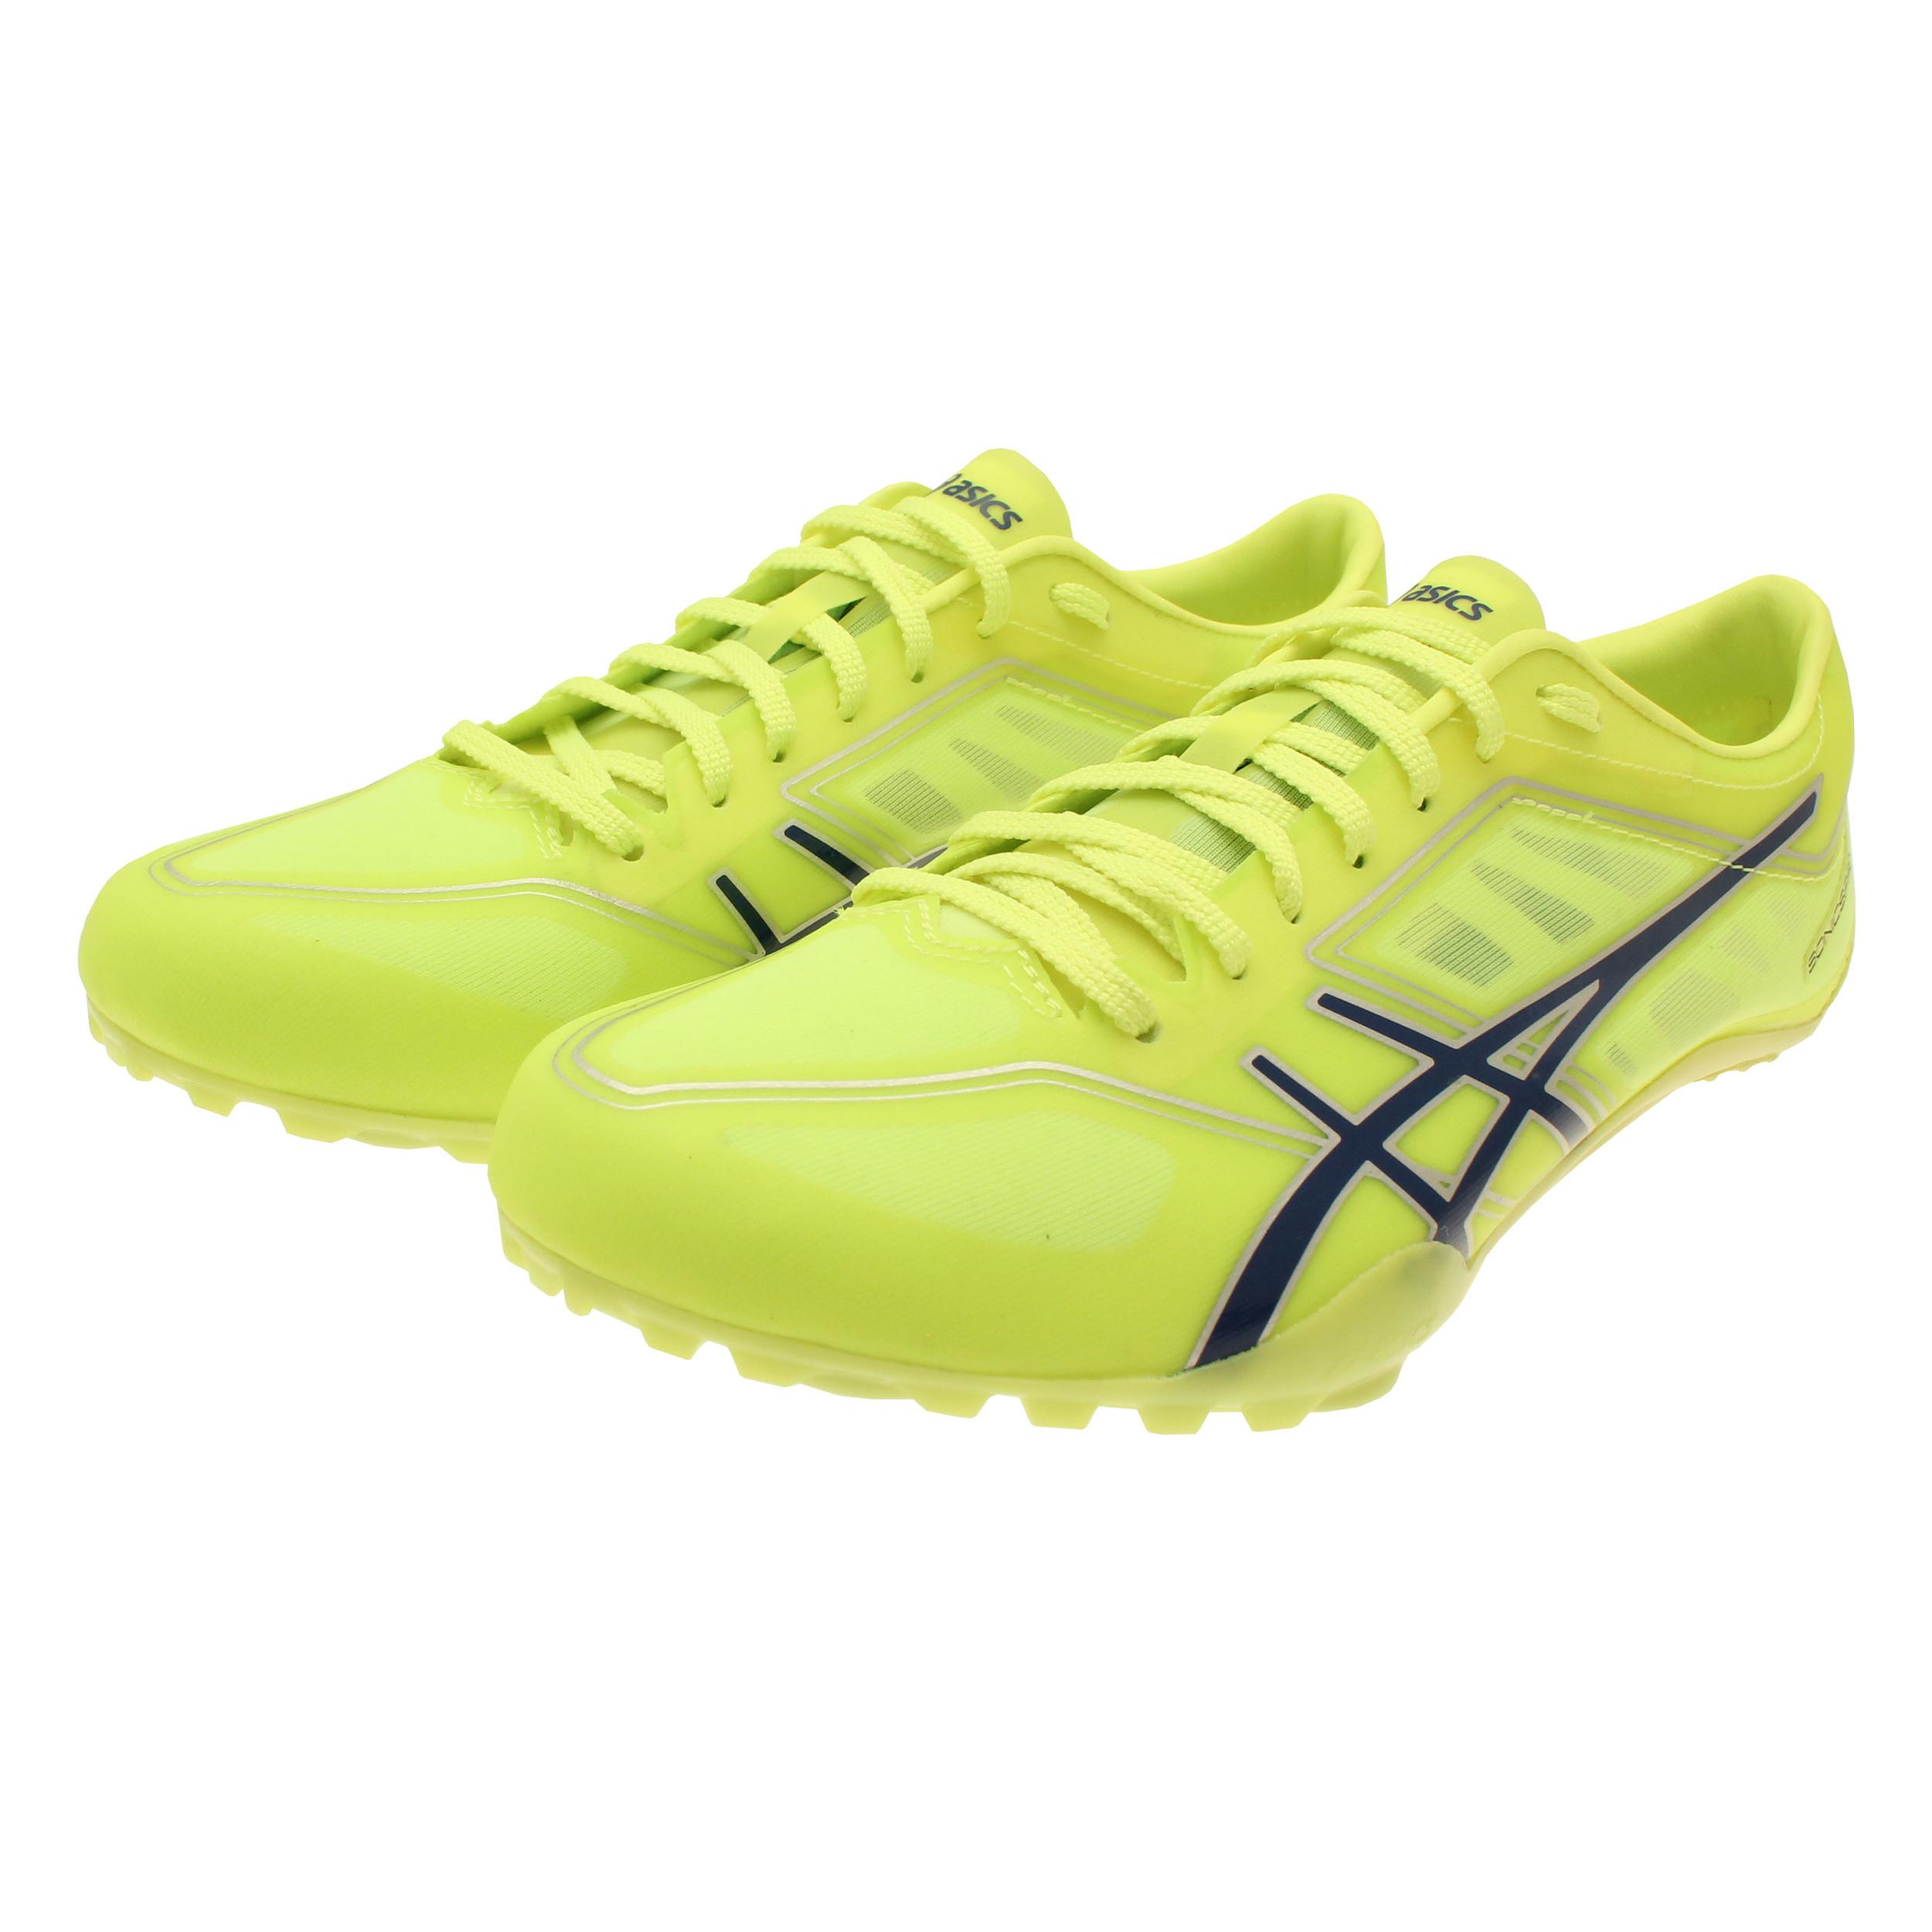 Scarpe sportive gialle per uomo Asics Sonicsprint Finishline Footlocker Salida Nn3wZl6